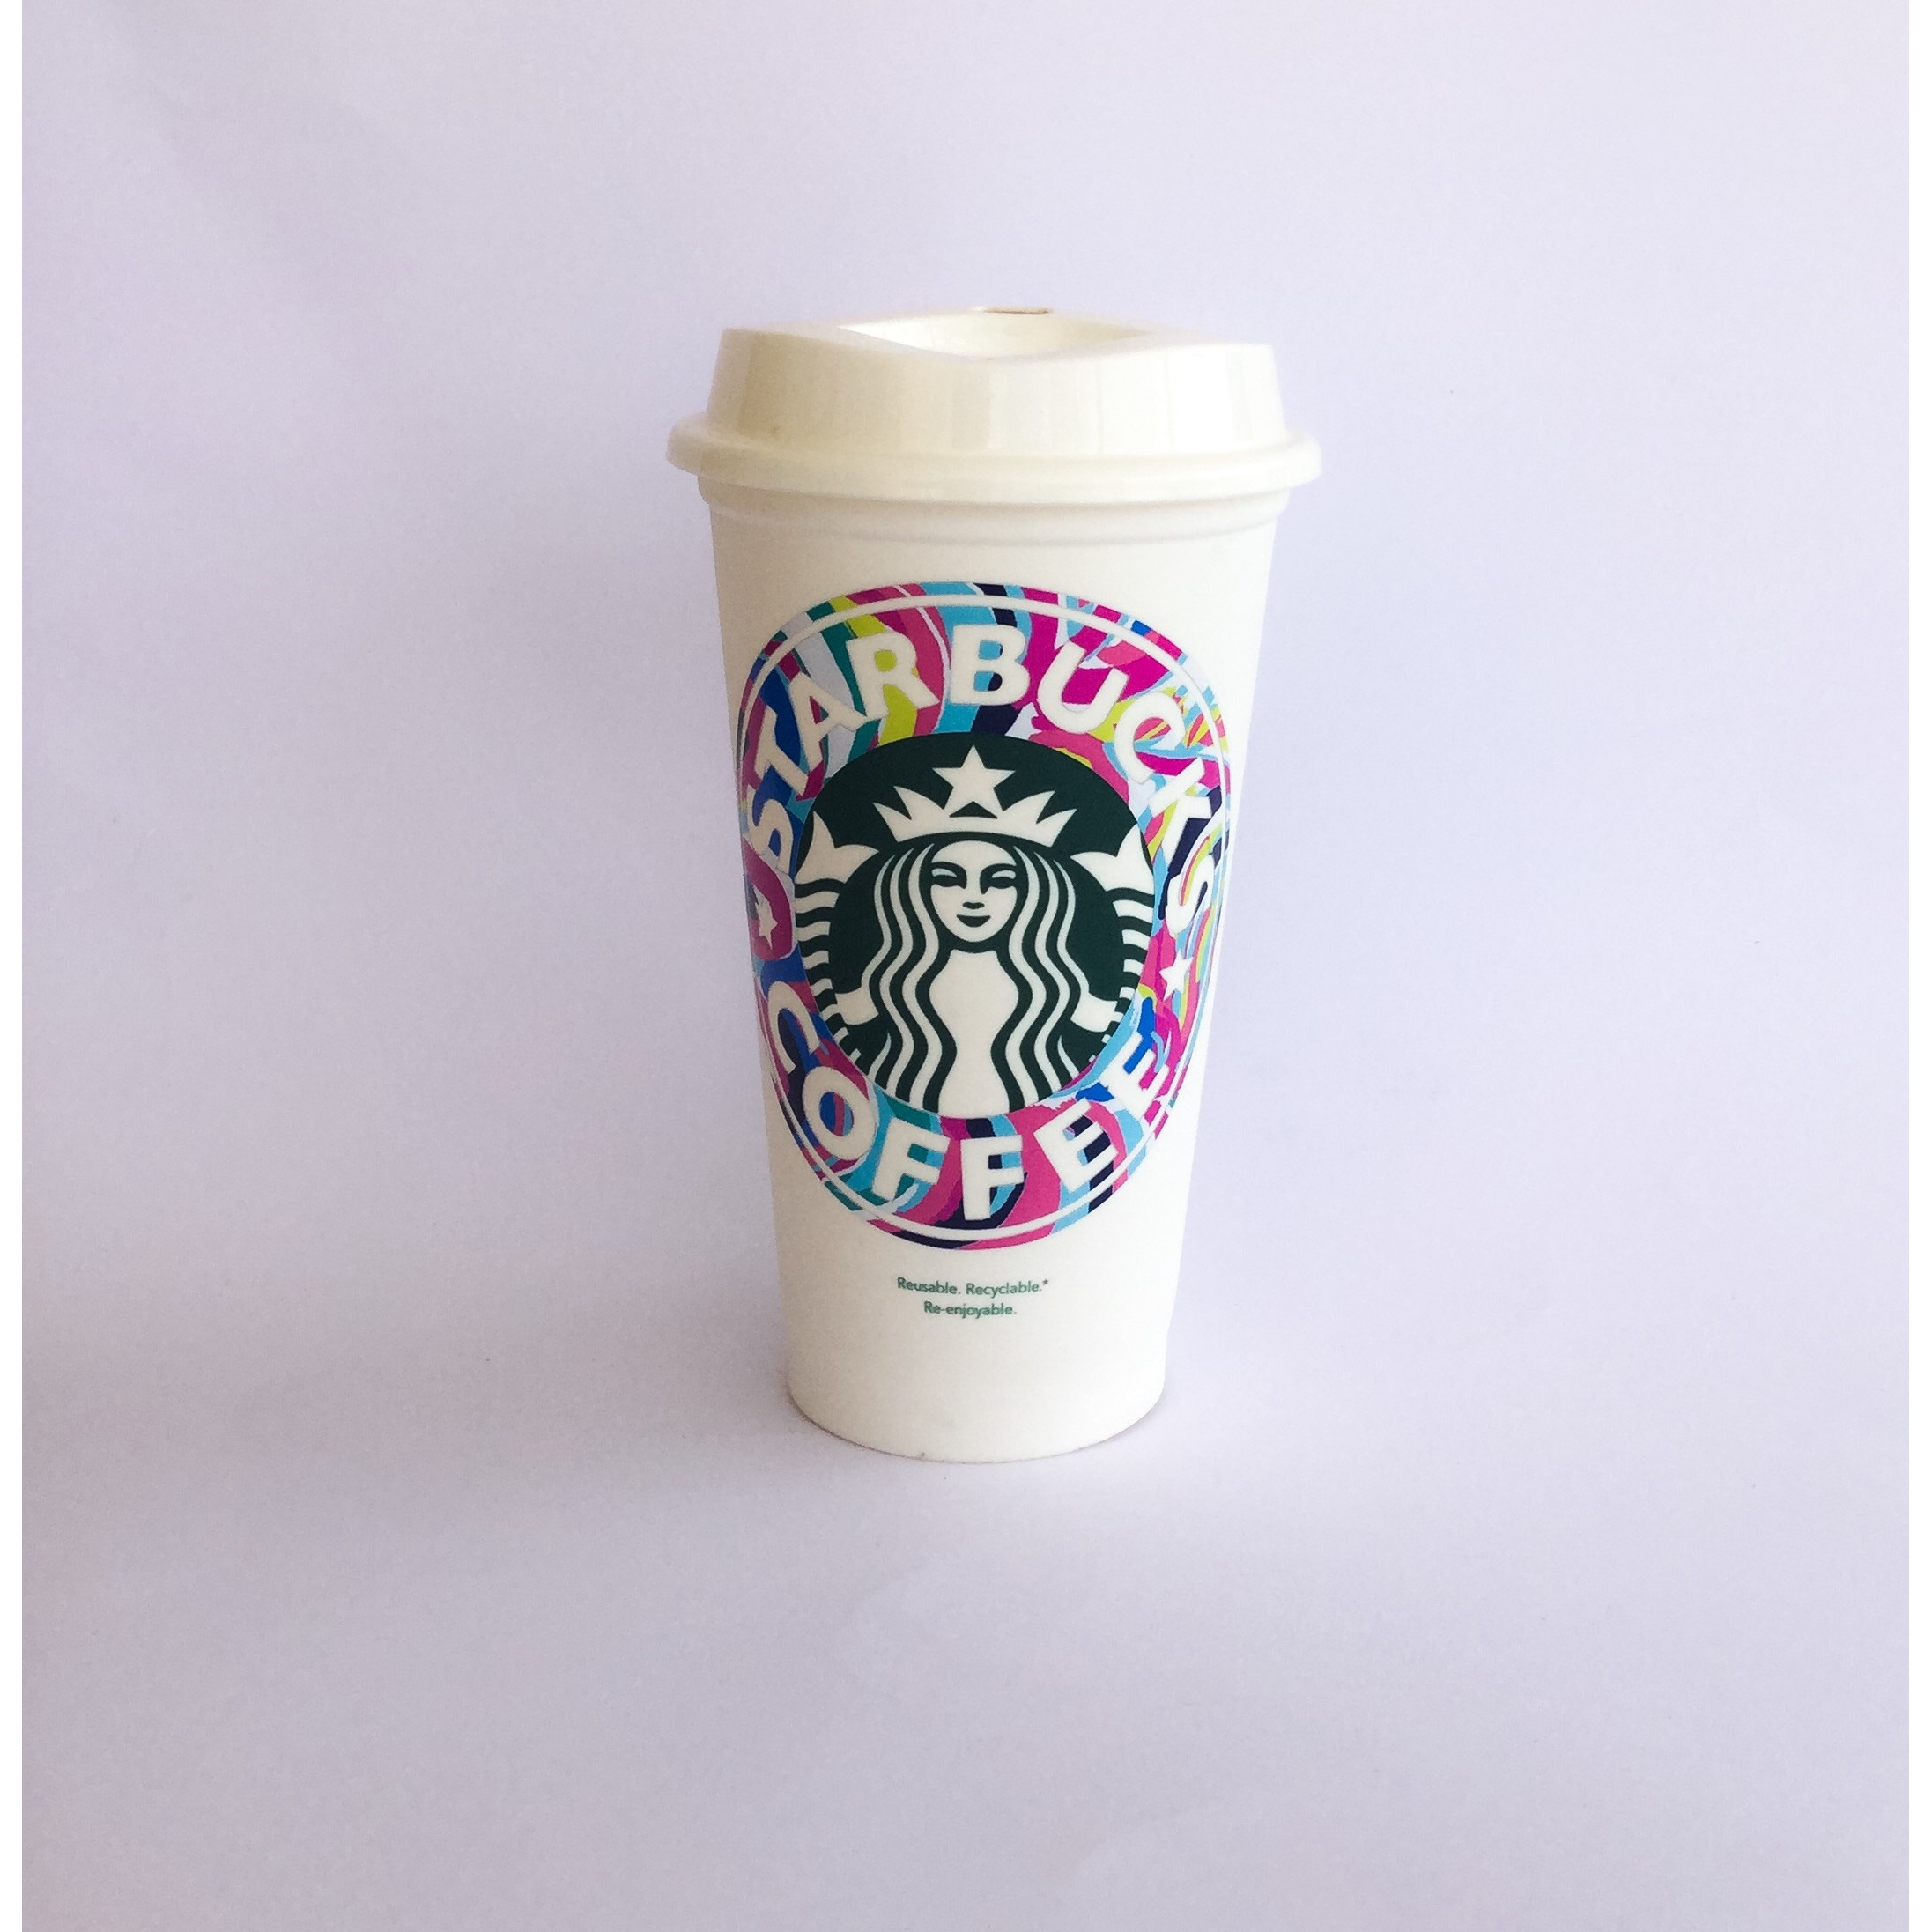 Lilly Starbucks Coffee Cup Starbucks Coffee Cup Starbucks Coffee Best Starbucks Coffee